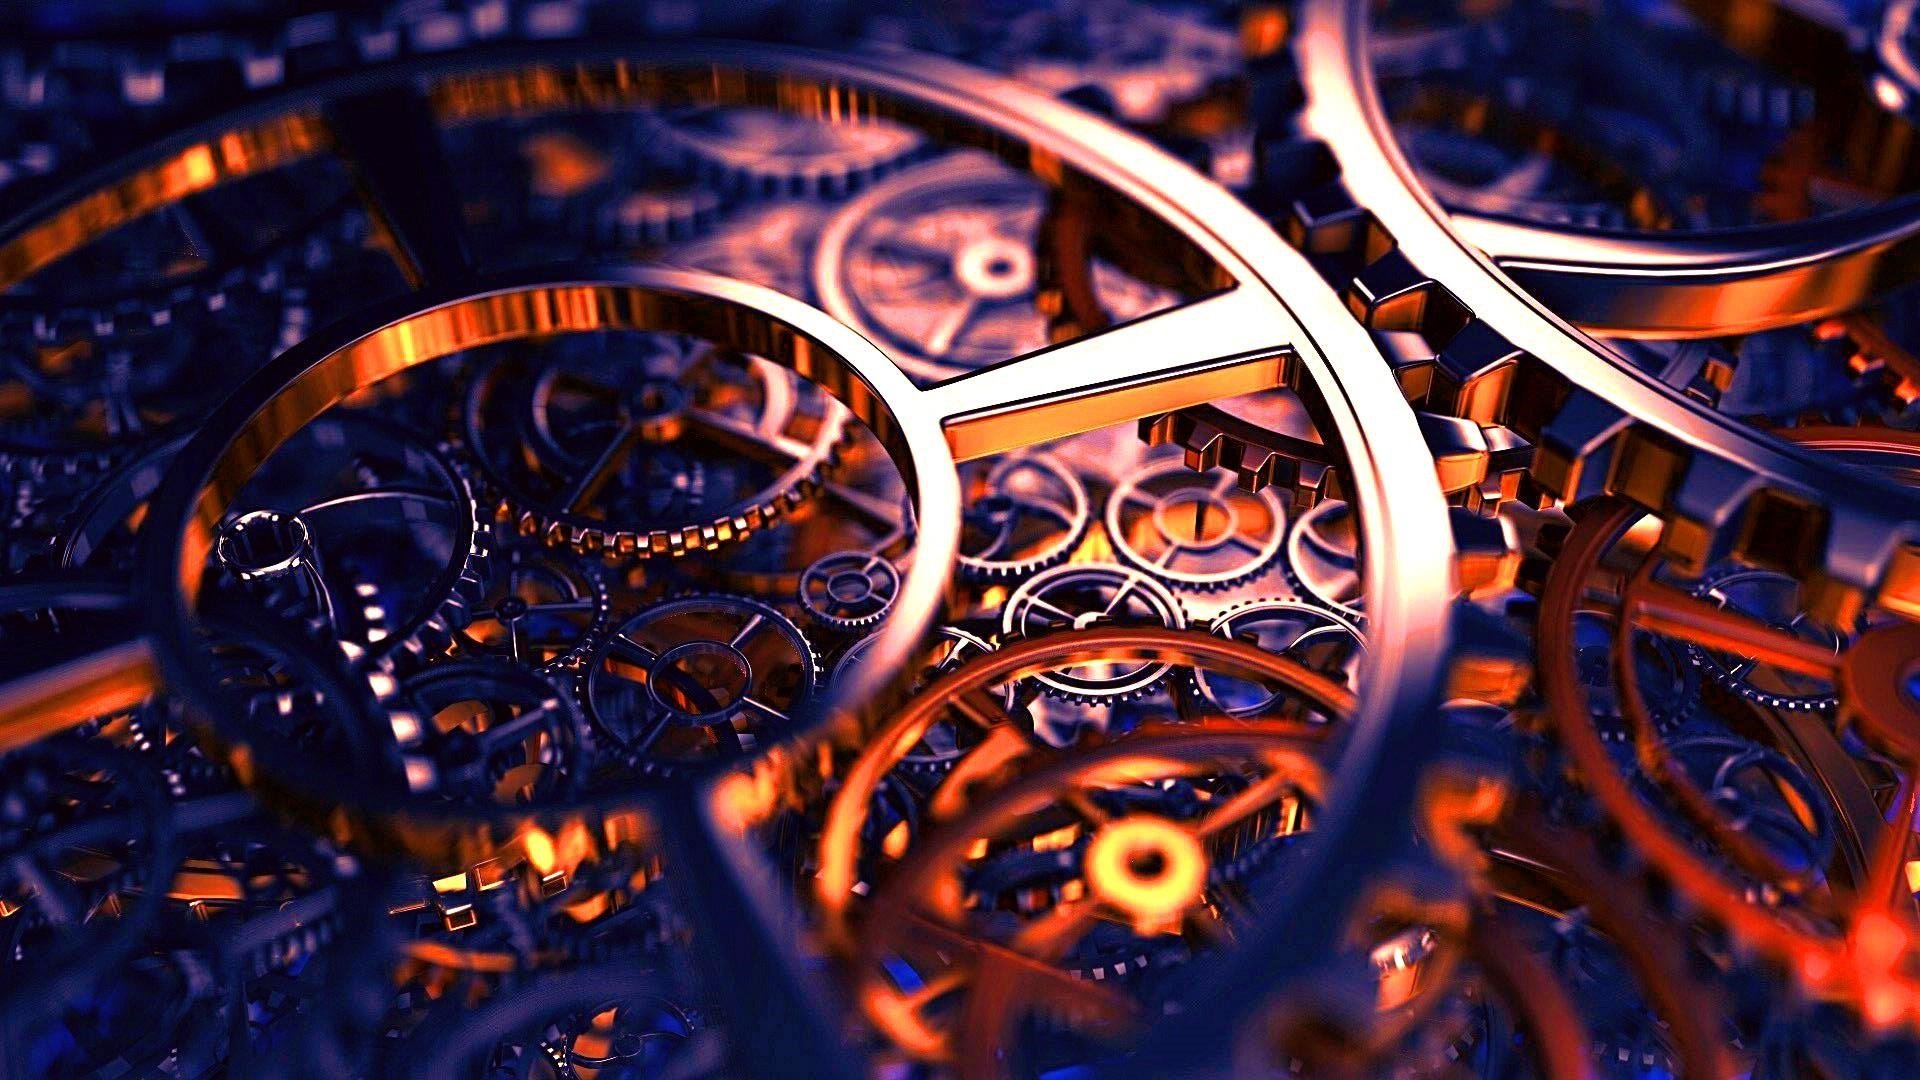 Clock mechanism wallpaper